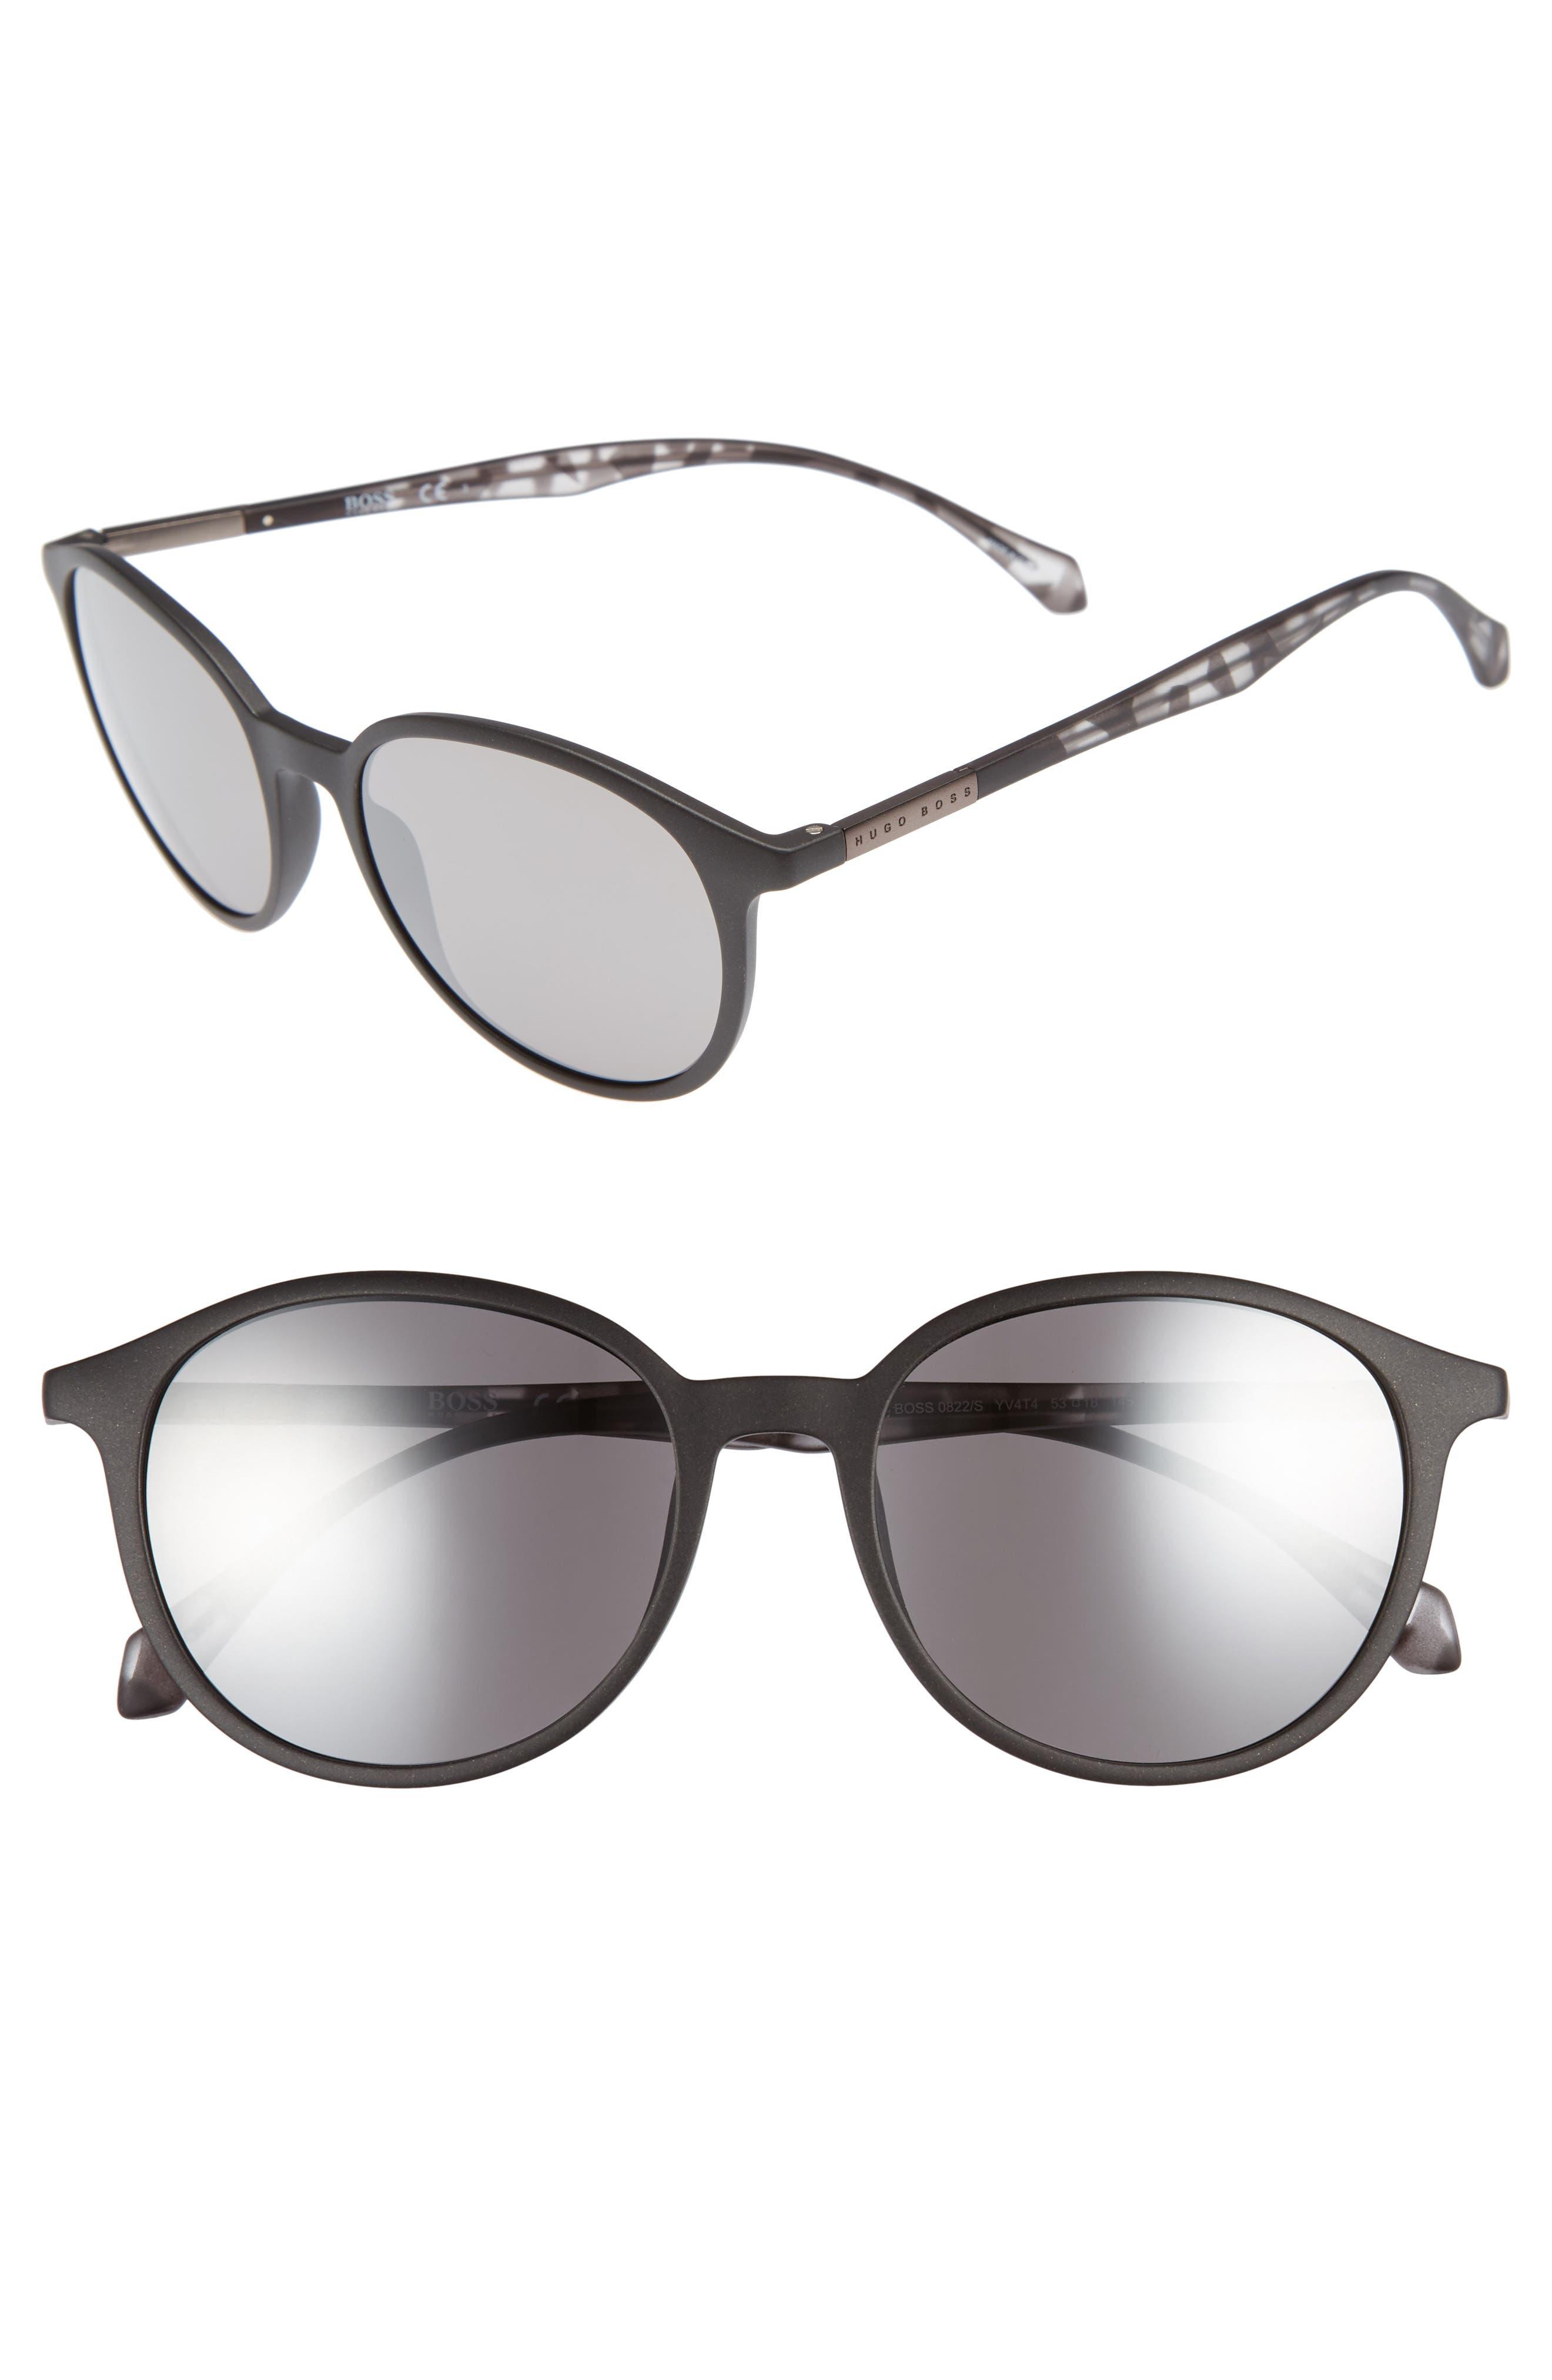 53mm Sunglasses,                         Main,                         color, 002